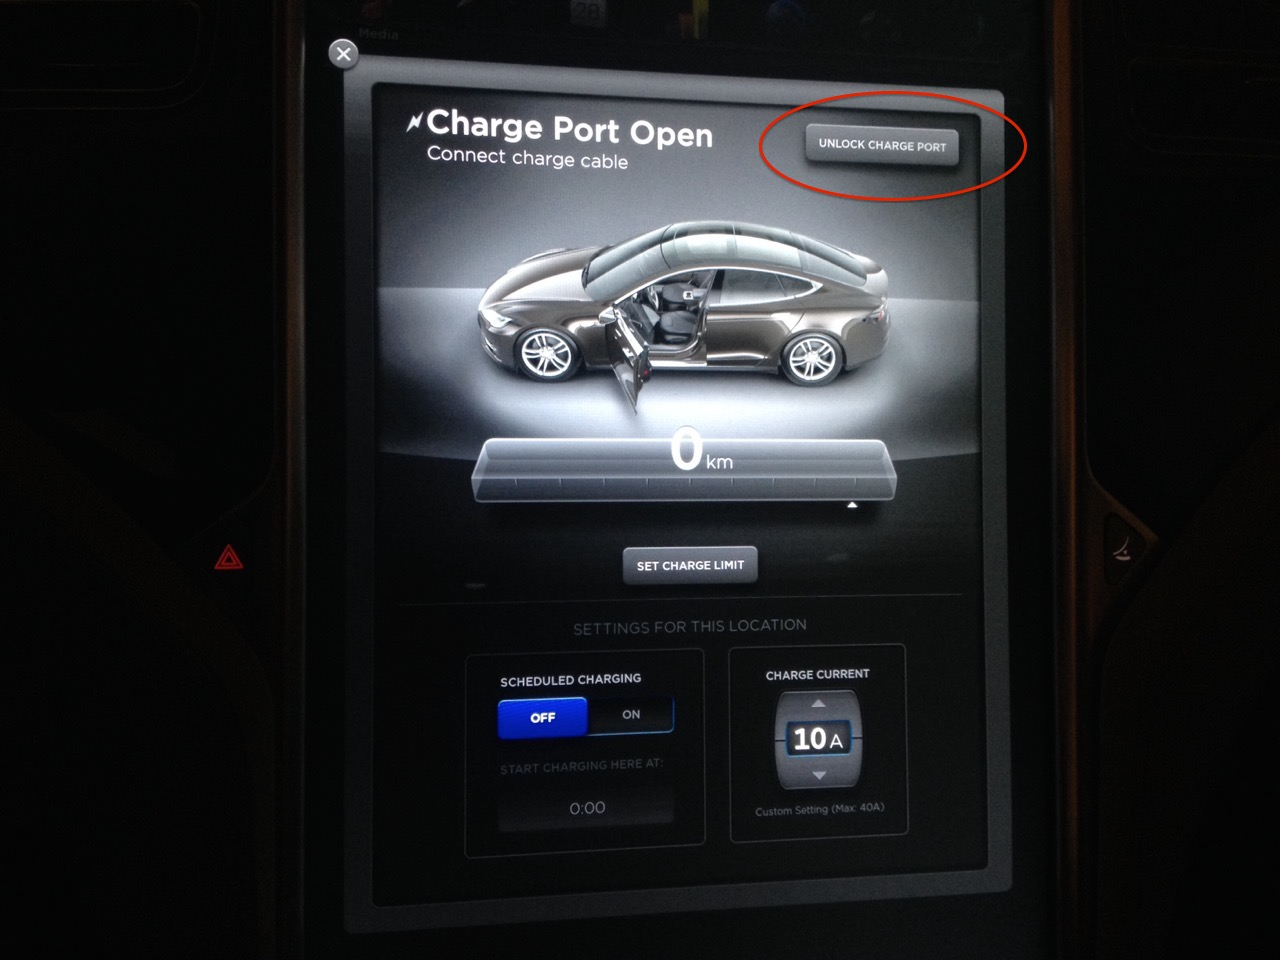 unlock_charge_port.jpg